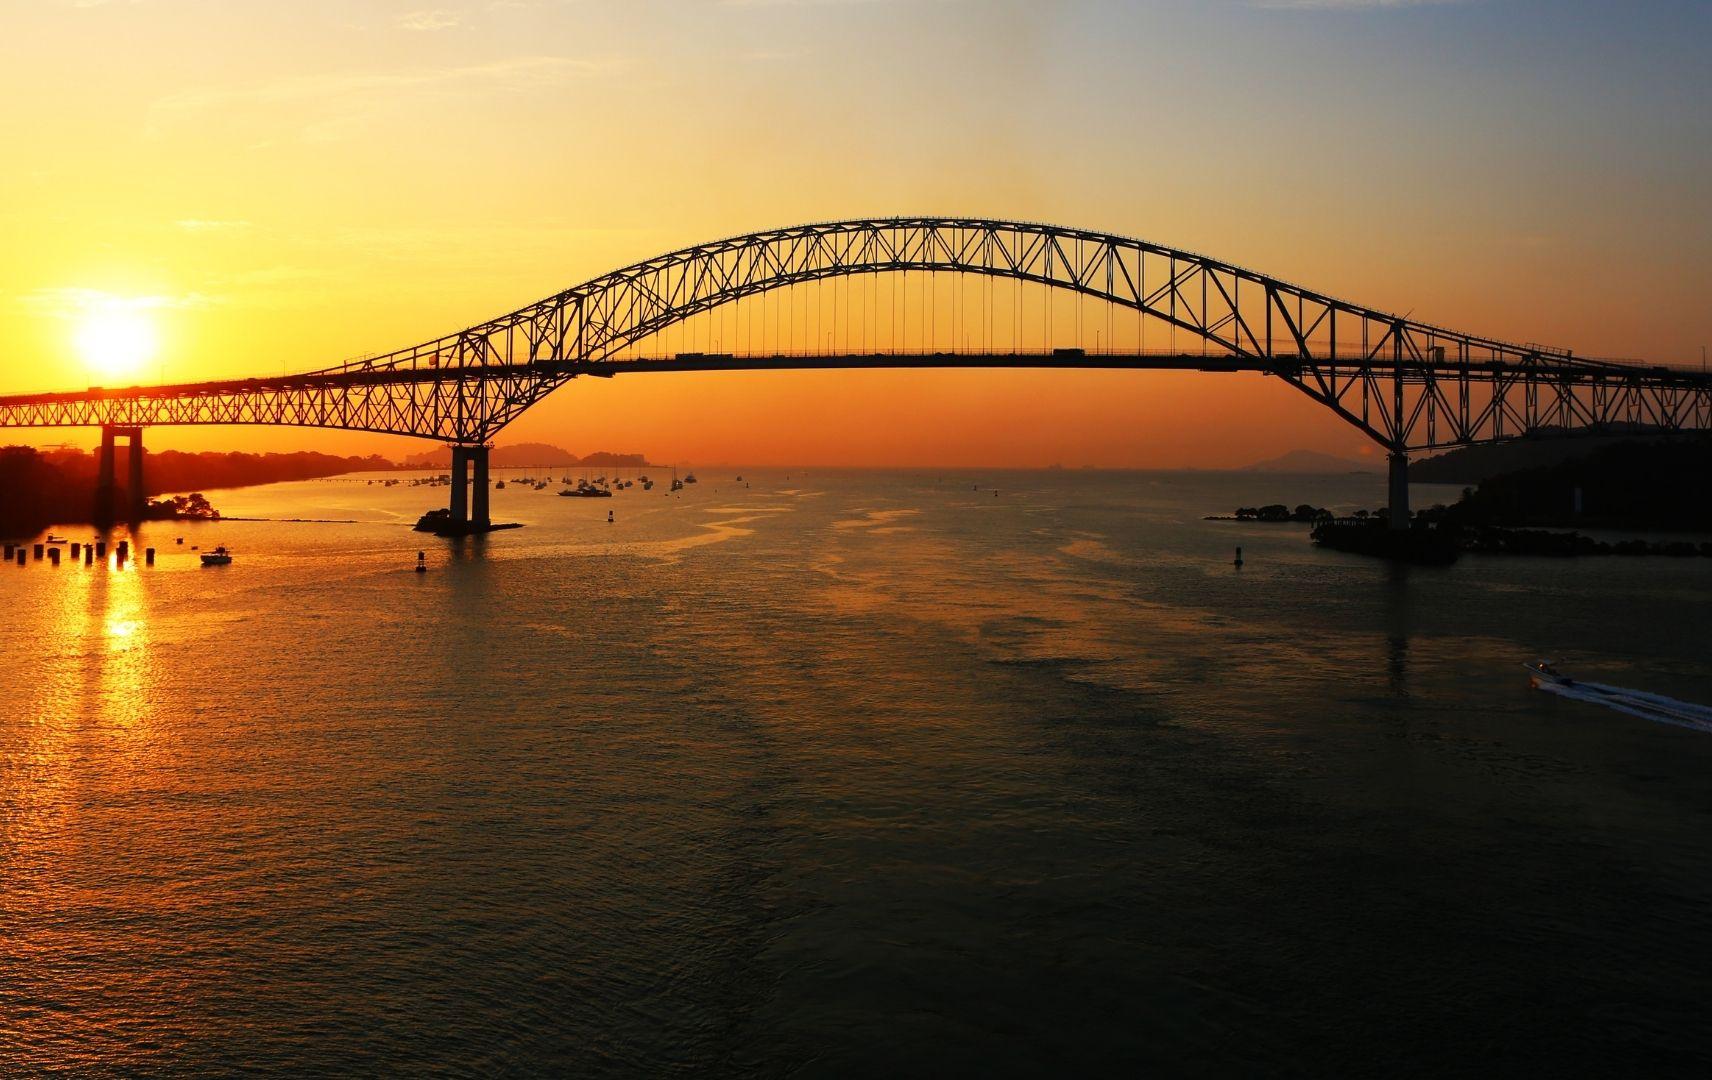 Kreuzfahrt top ten - Panamakanal